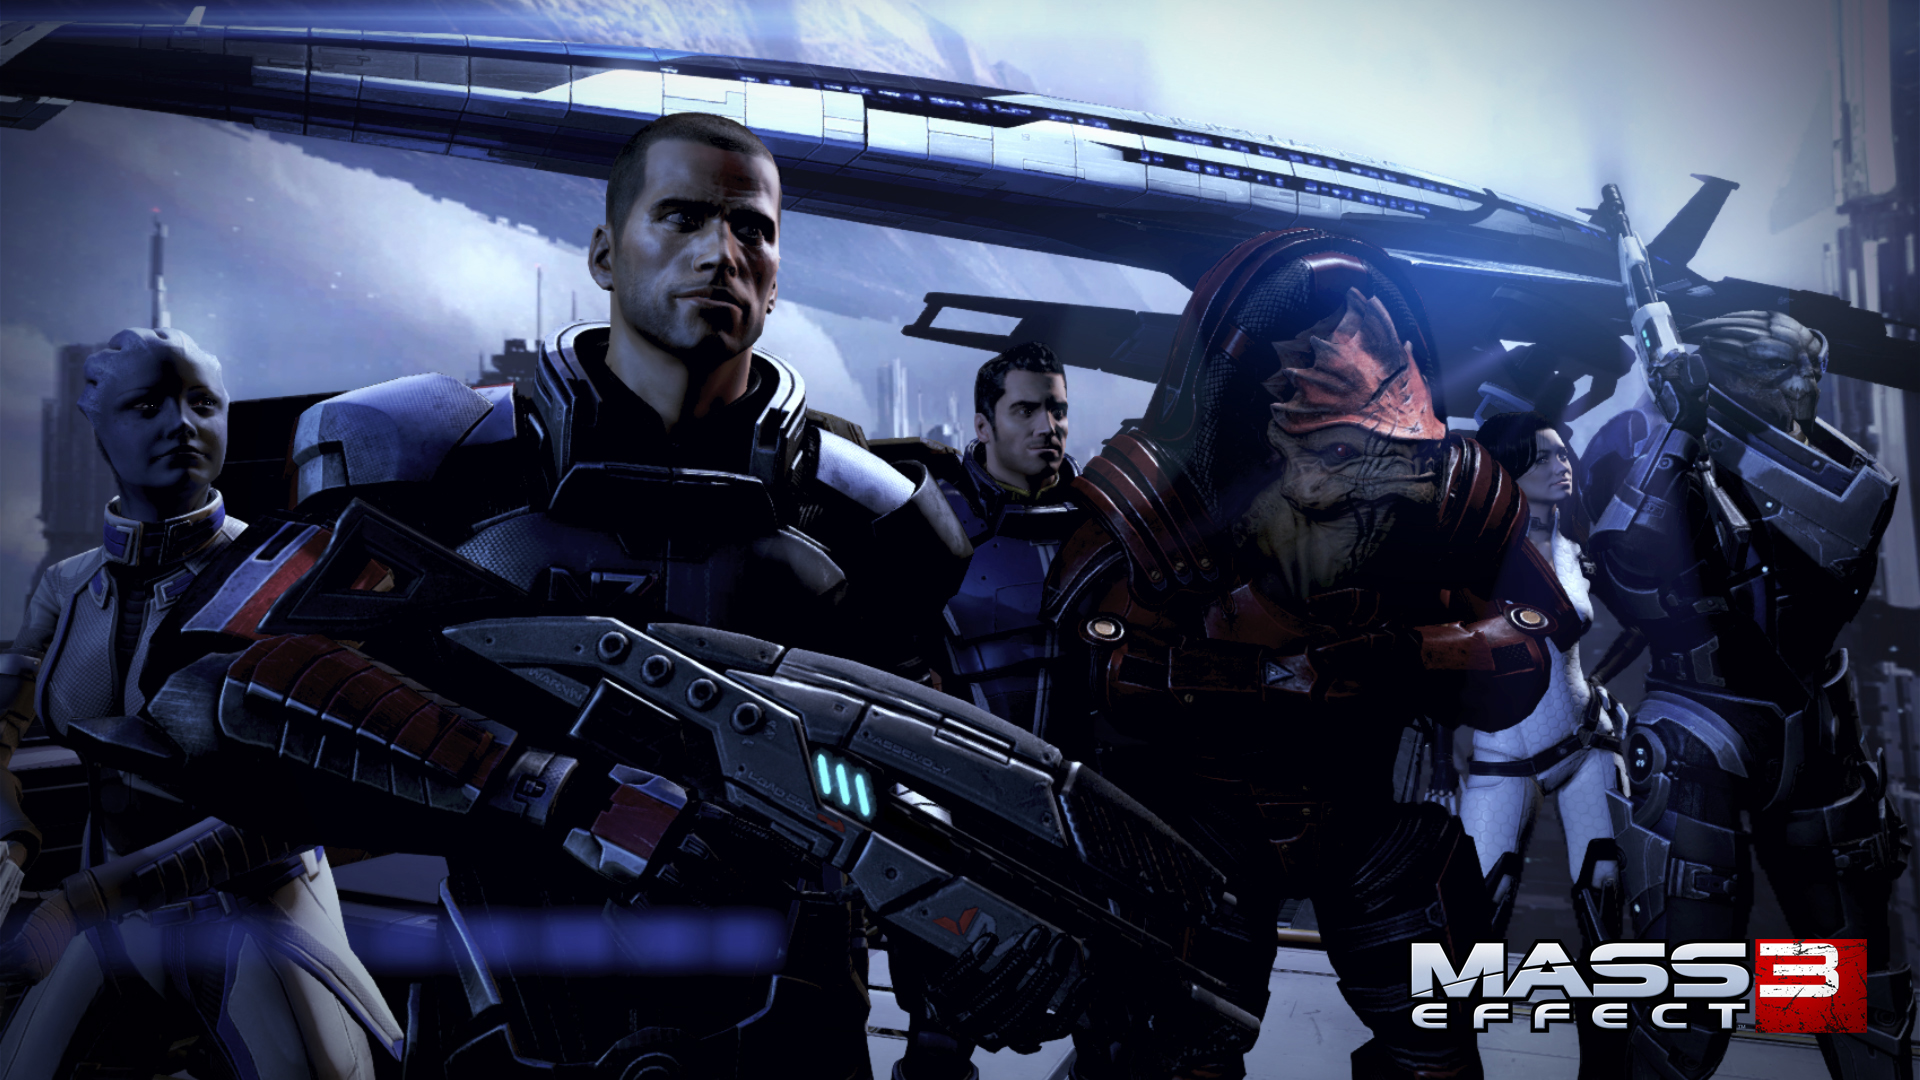 Mass Effect 3 Citadel Image